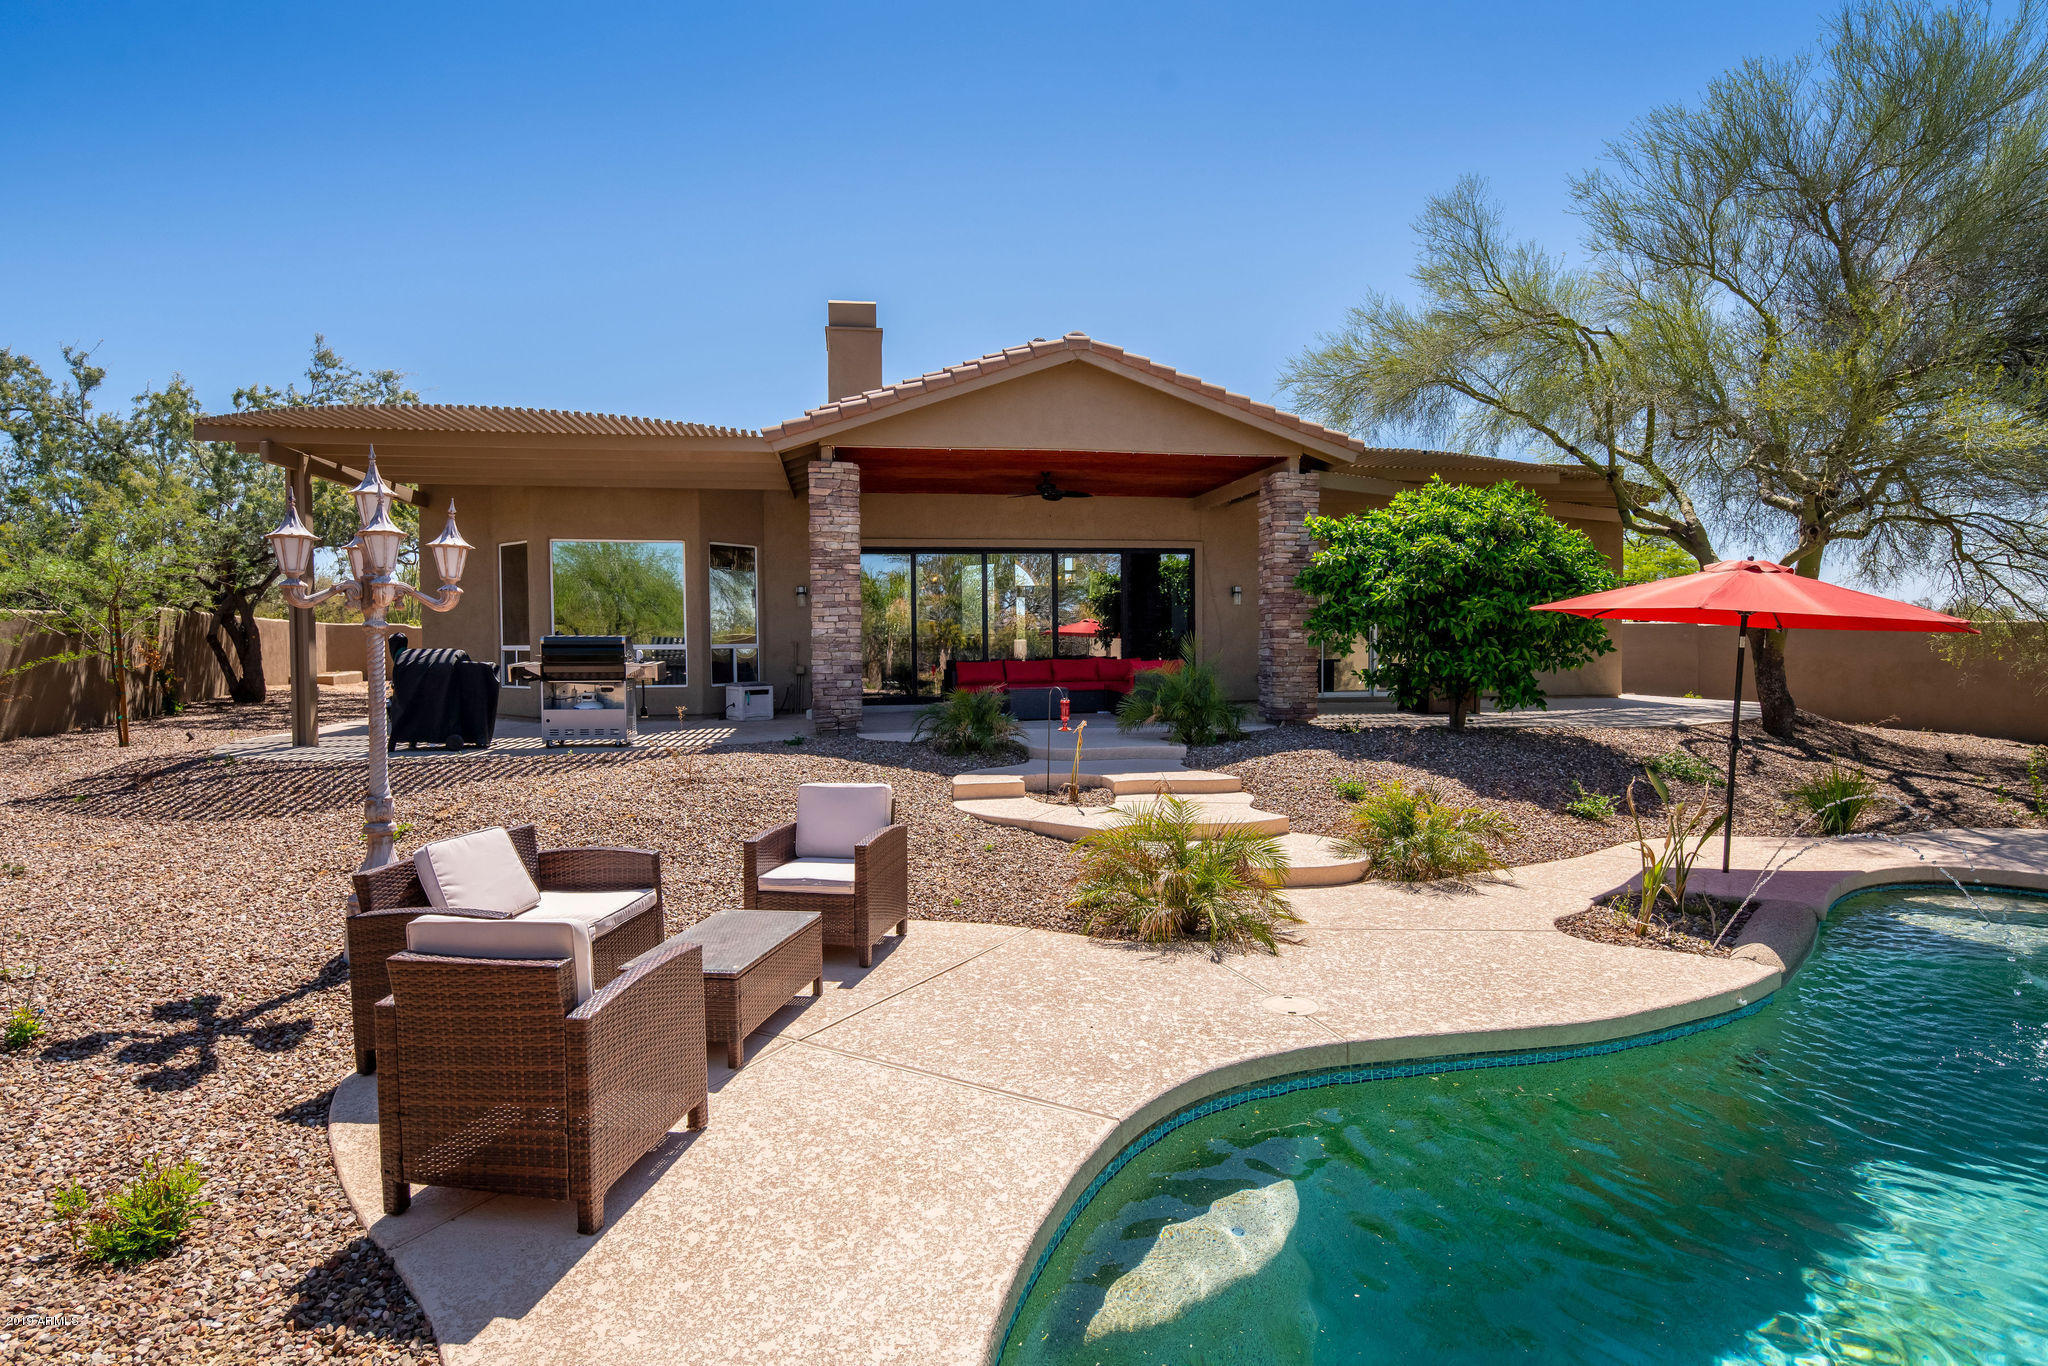 MLS 5910780 27616 N 72ND Way, Scottsdale, AZ 85266 Scottsdale AZ Private Pool